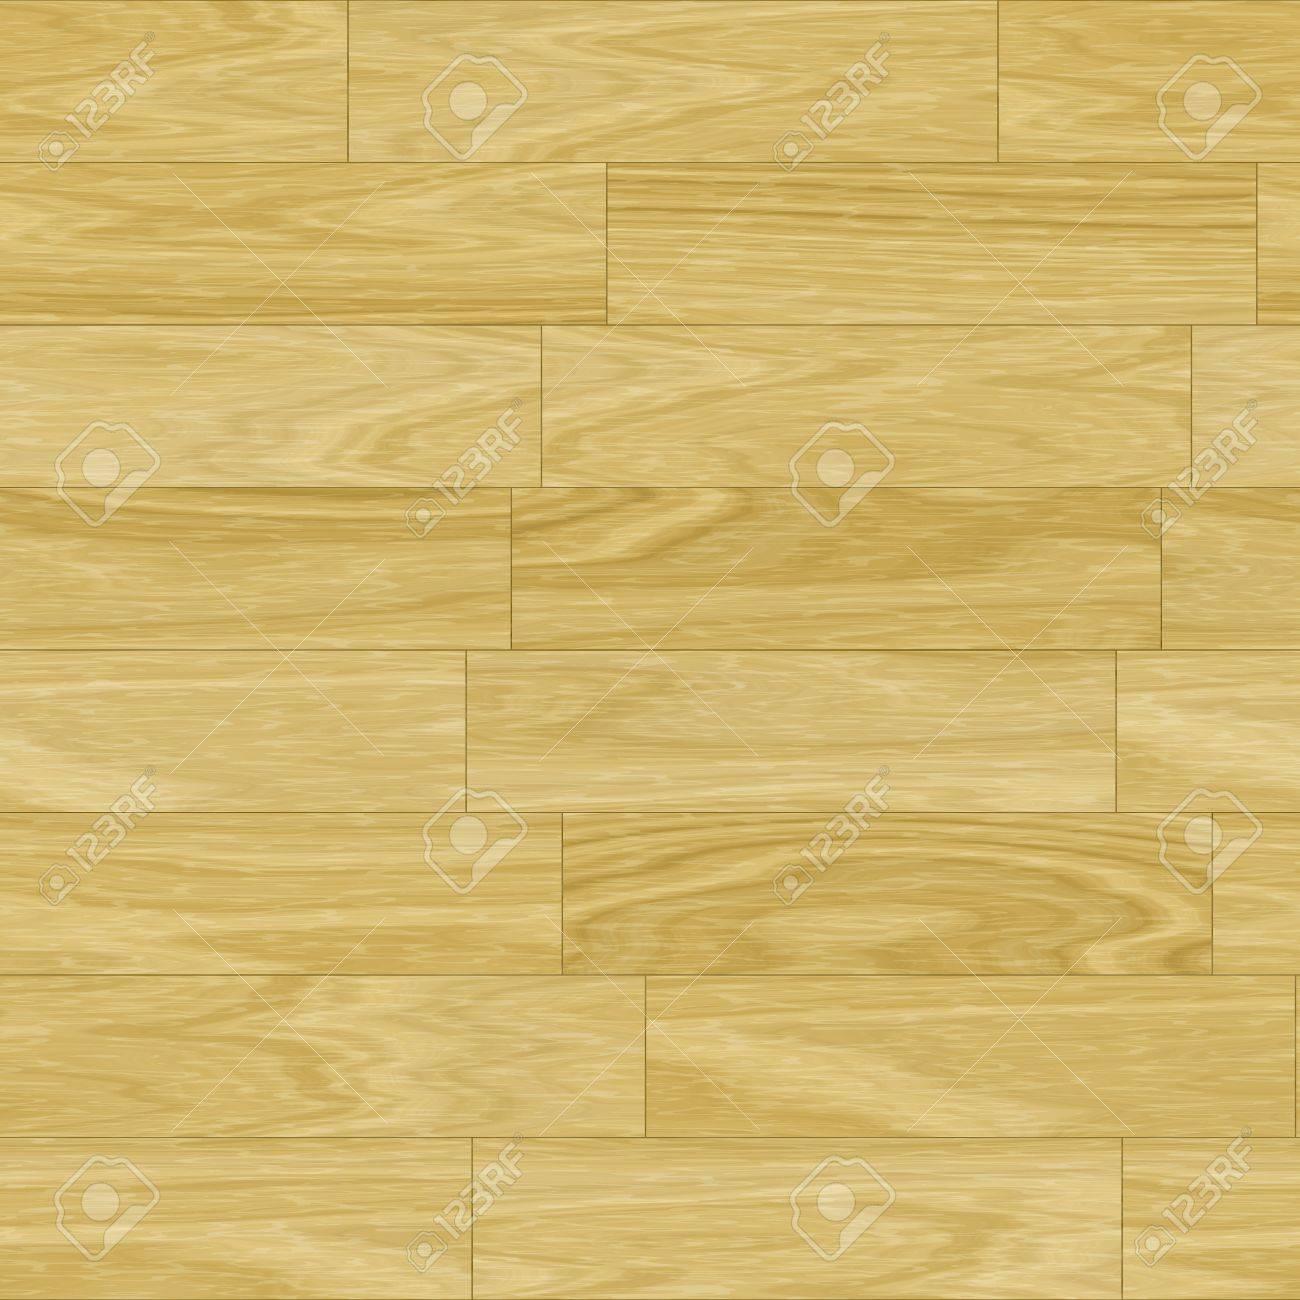 Wooden parquet flooring surface pattern texture seamless background Stock Photo - 4566110